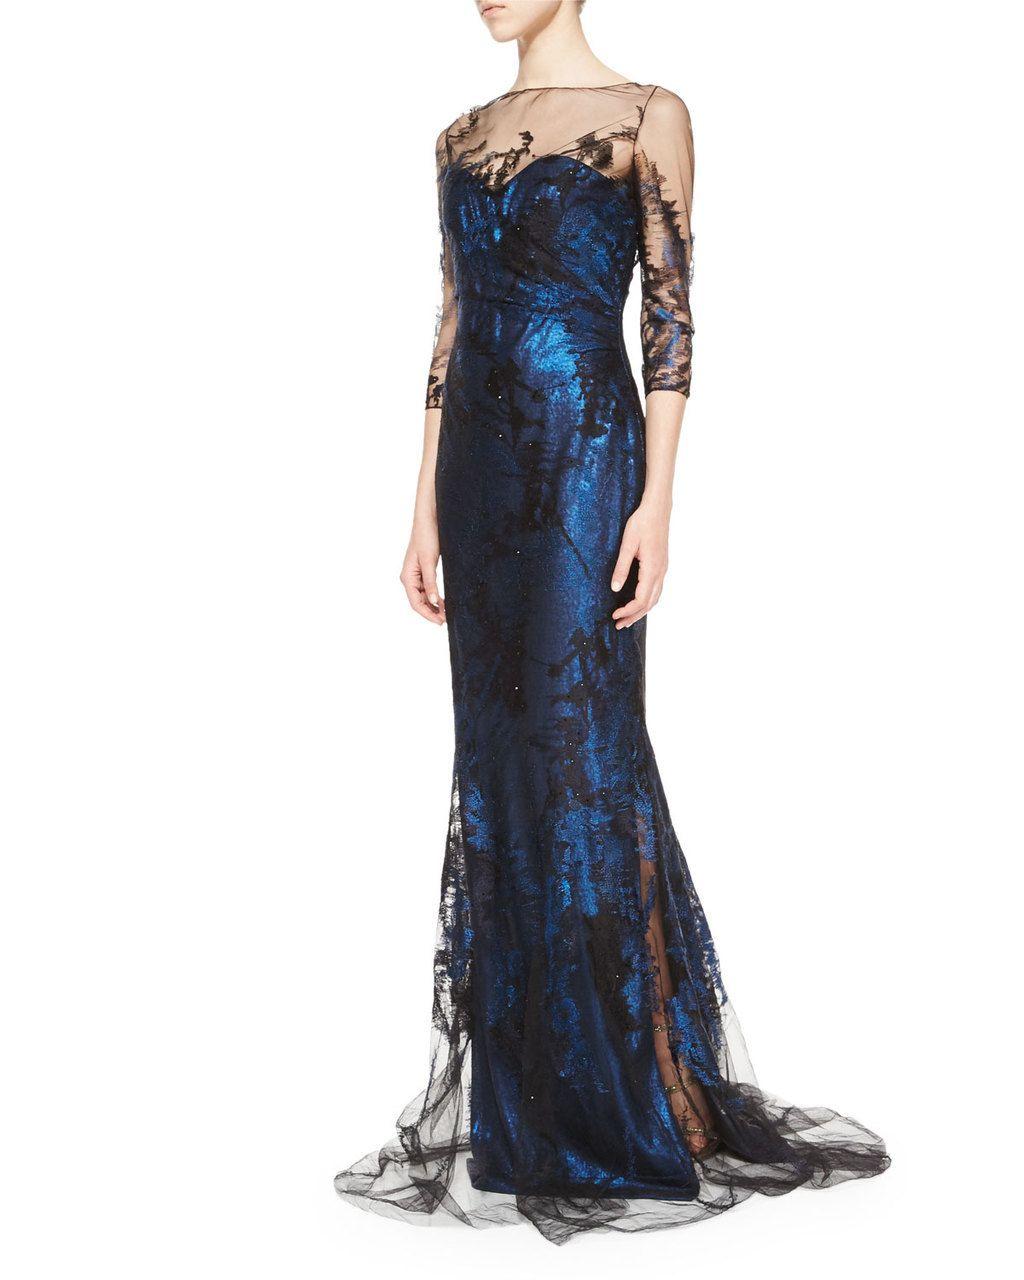 7ac336c8abb RENE RUIZ 3 4-Sleeve Illusion Lace Gown Cobalt Black  1